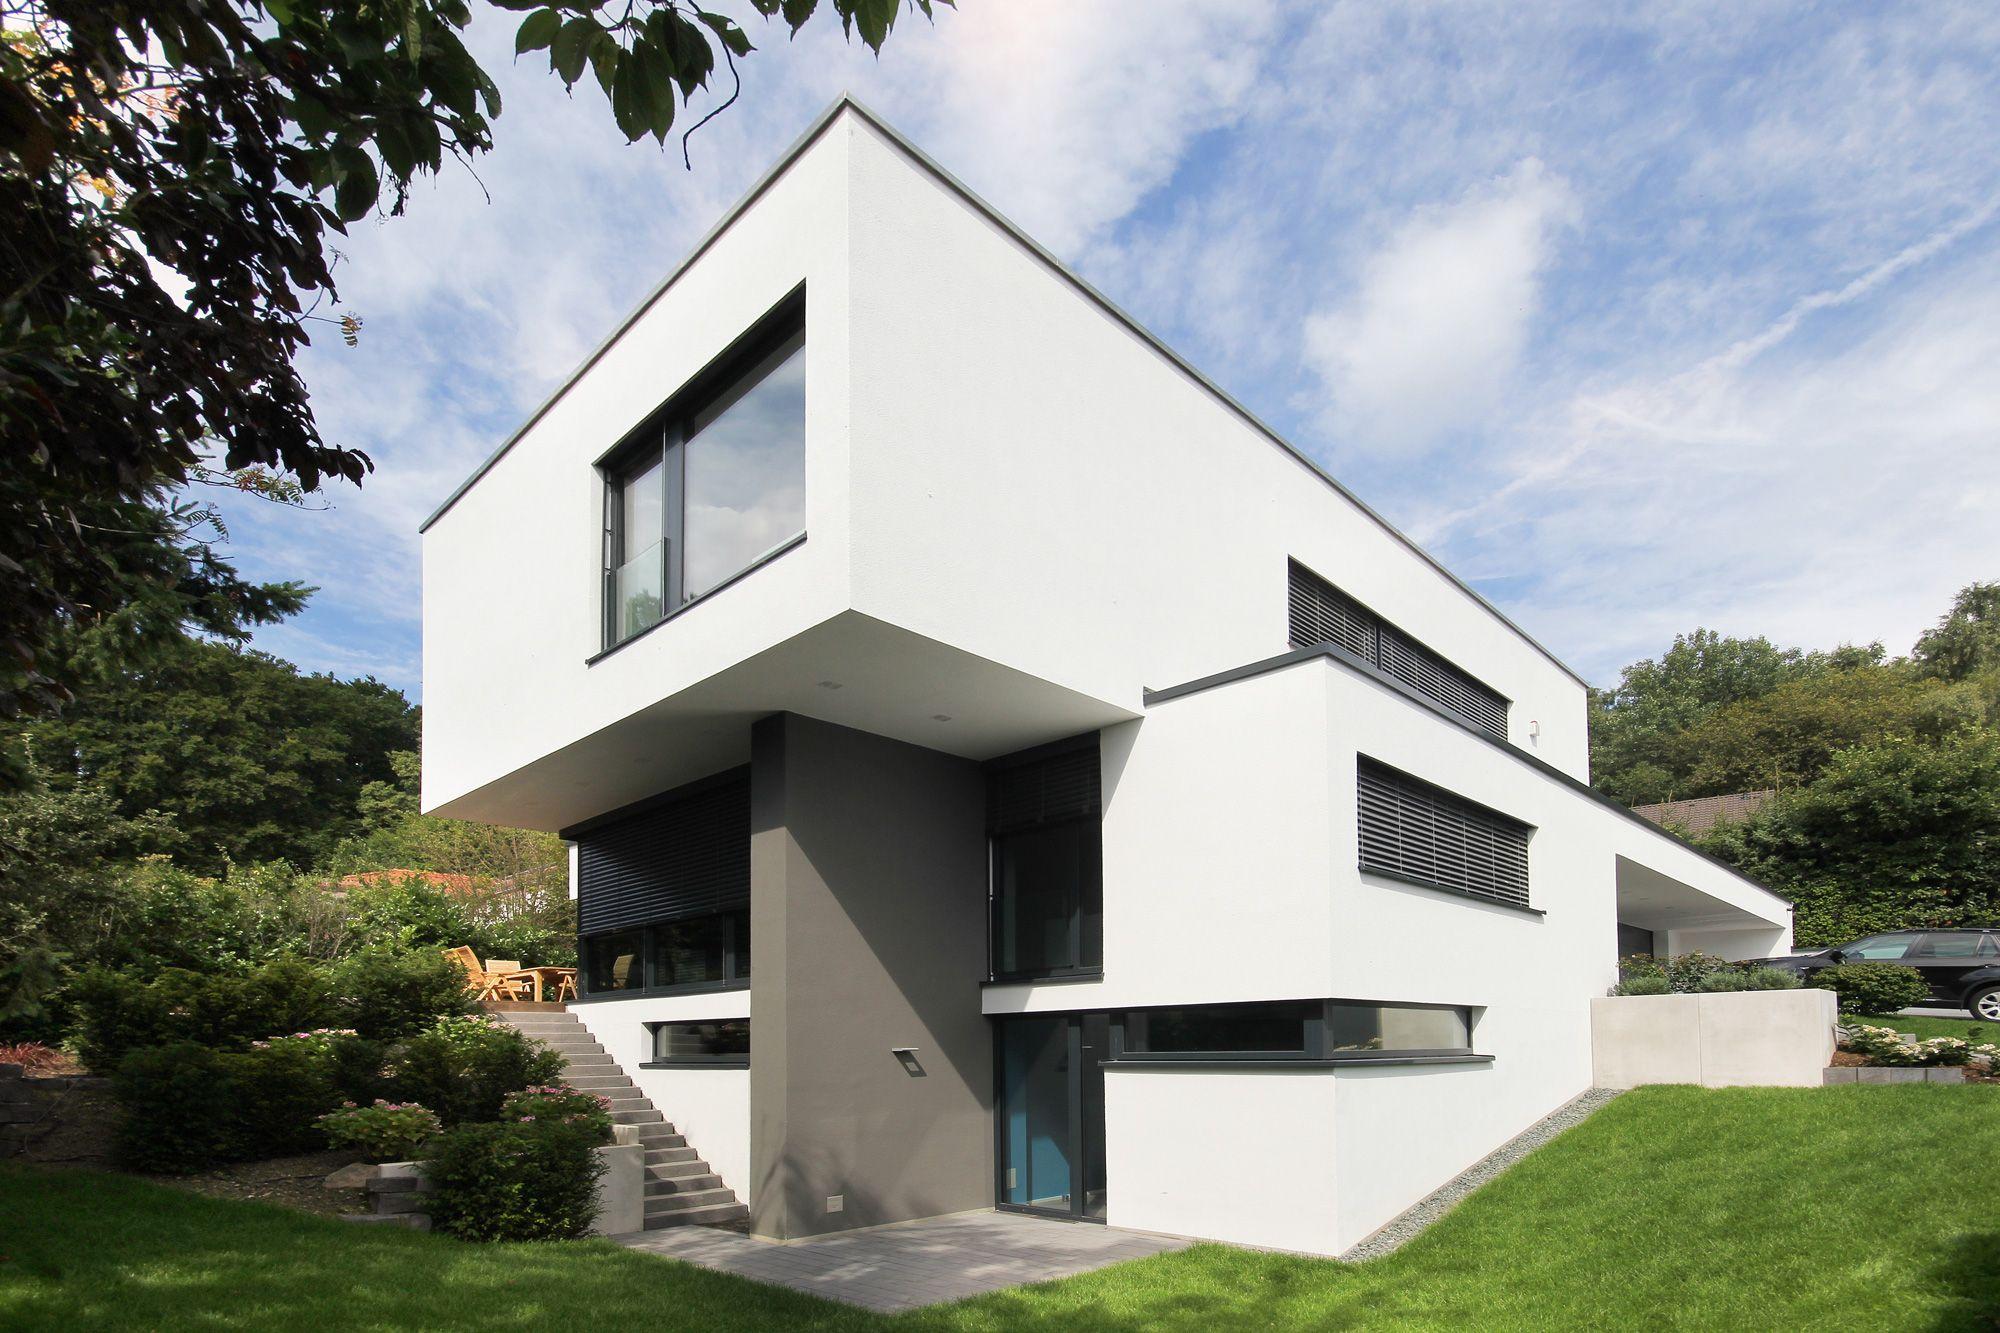 Neubau Architektenhaus - schlüsselfertig & zum Festpreis ...